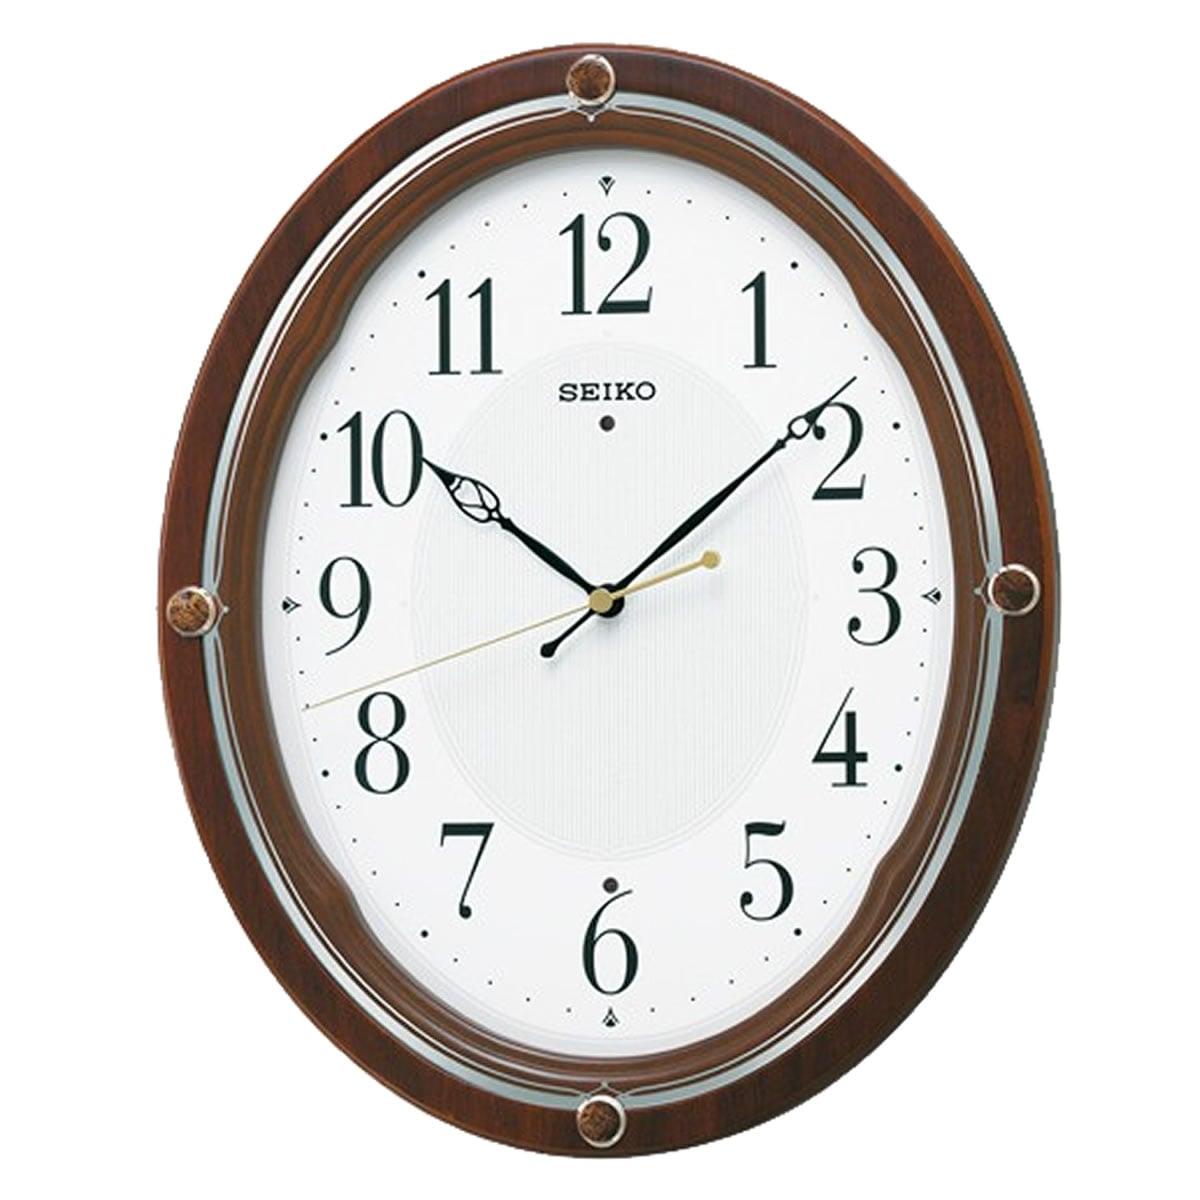 SEIKO(セイコー)スタンダード 木枠 電波掛け時計 KX209B 茶